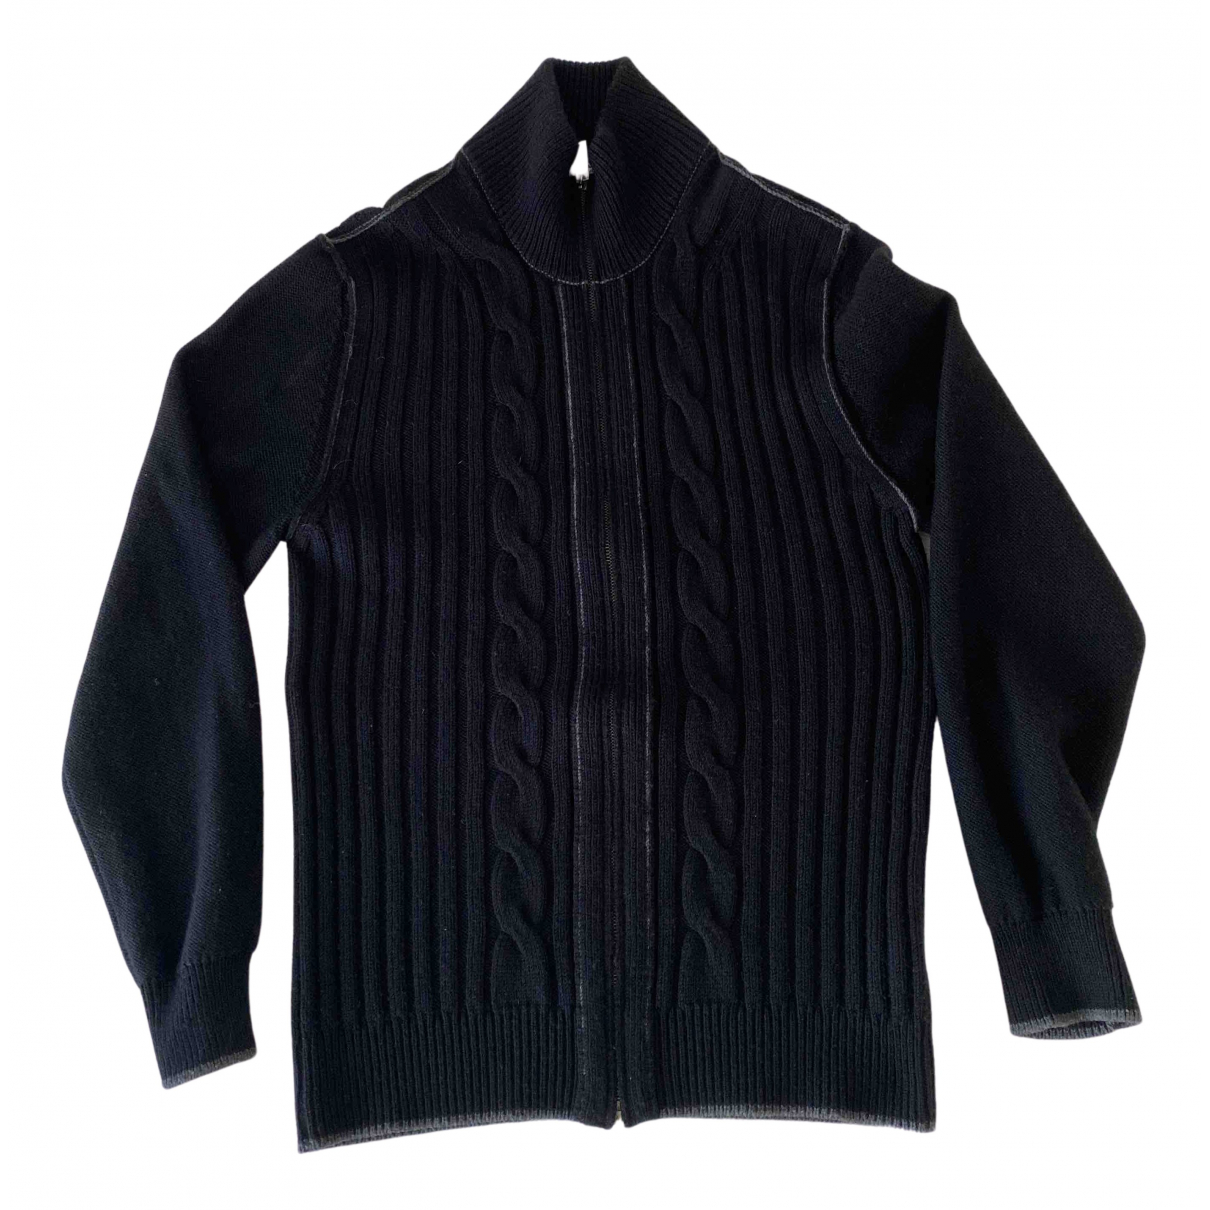 Moschino N Black Wool Knitwear & Sweatshirts for Men XL International